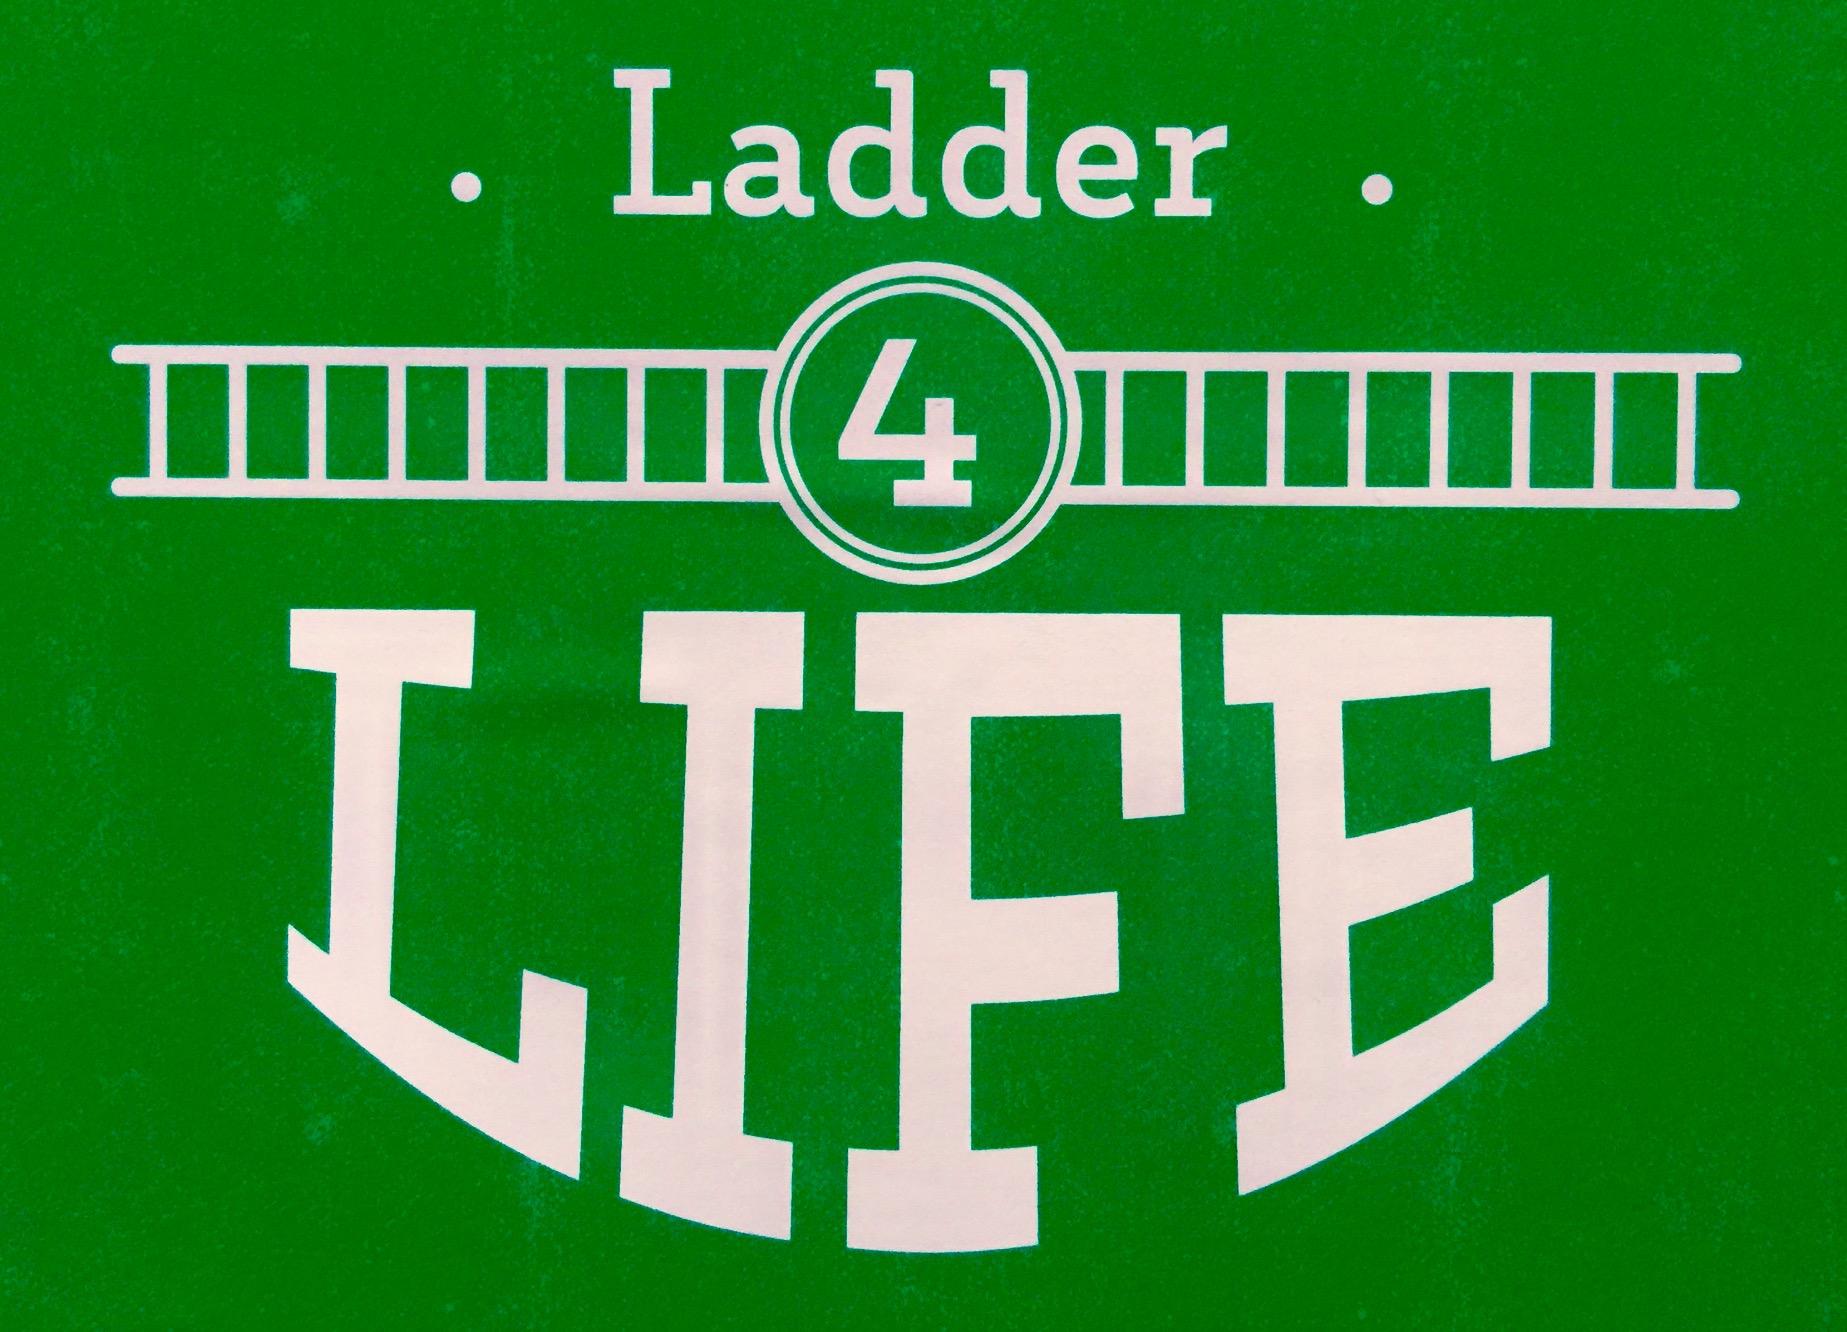 Ladder4Life